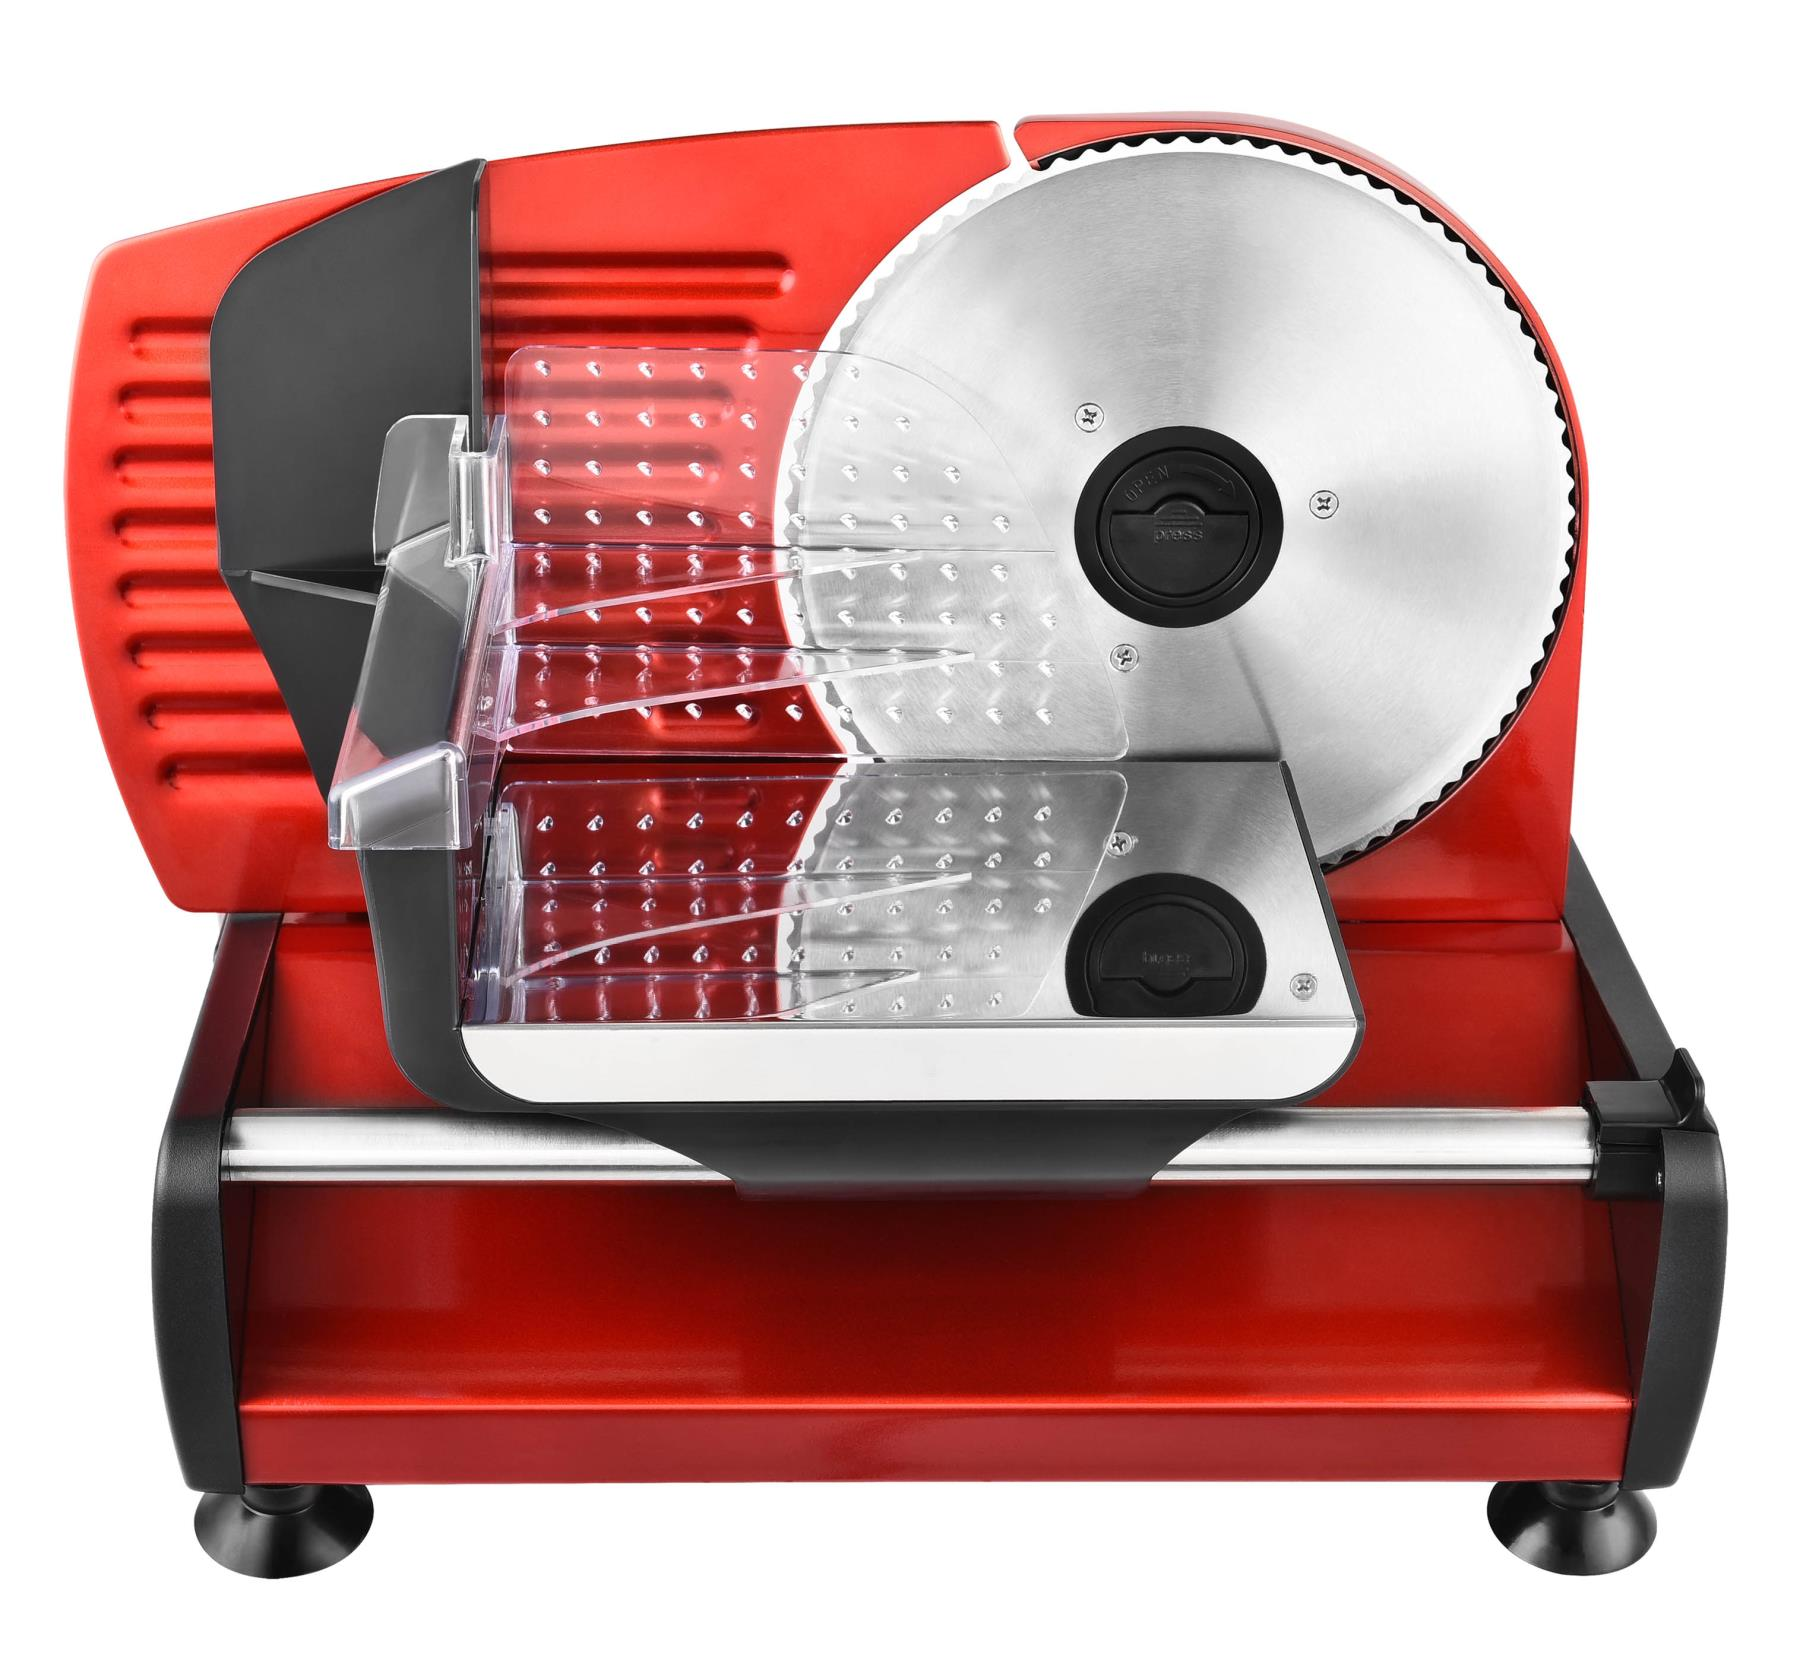 Metall Allesschneider Brotschneidemaschine Edelstahlmesser 19cm Rot*80381